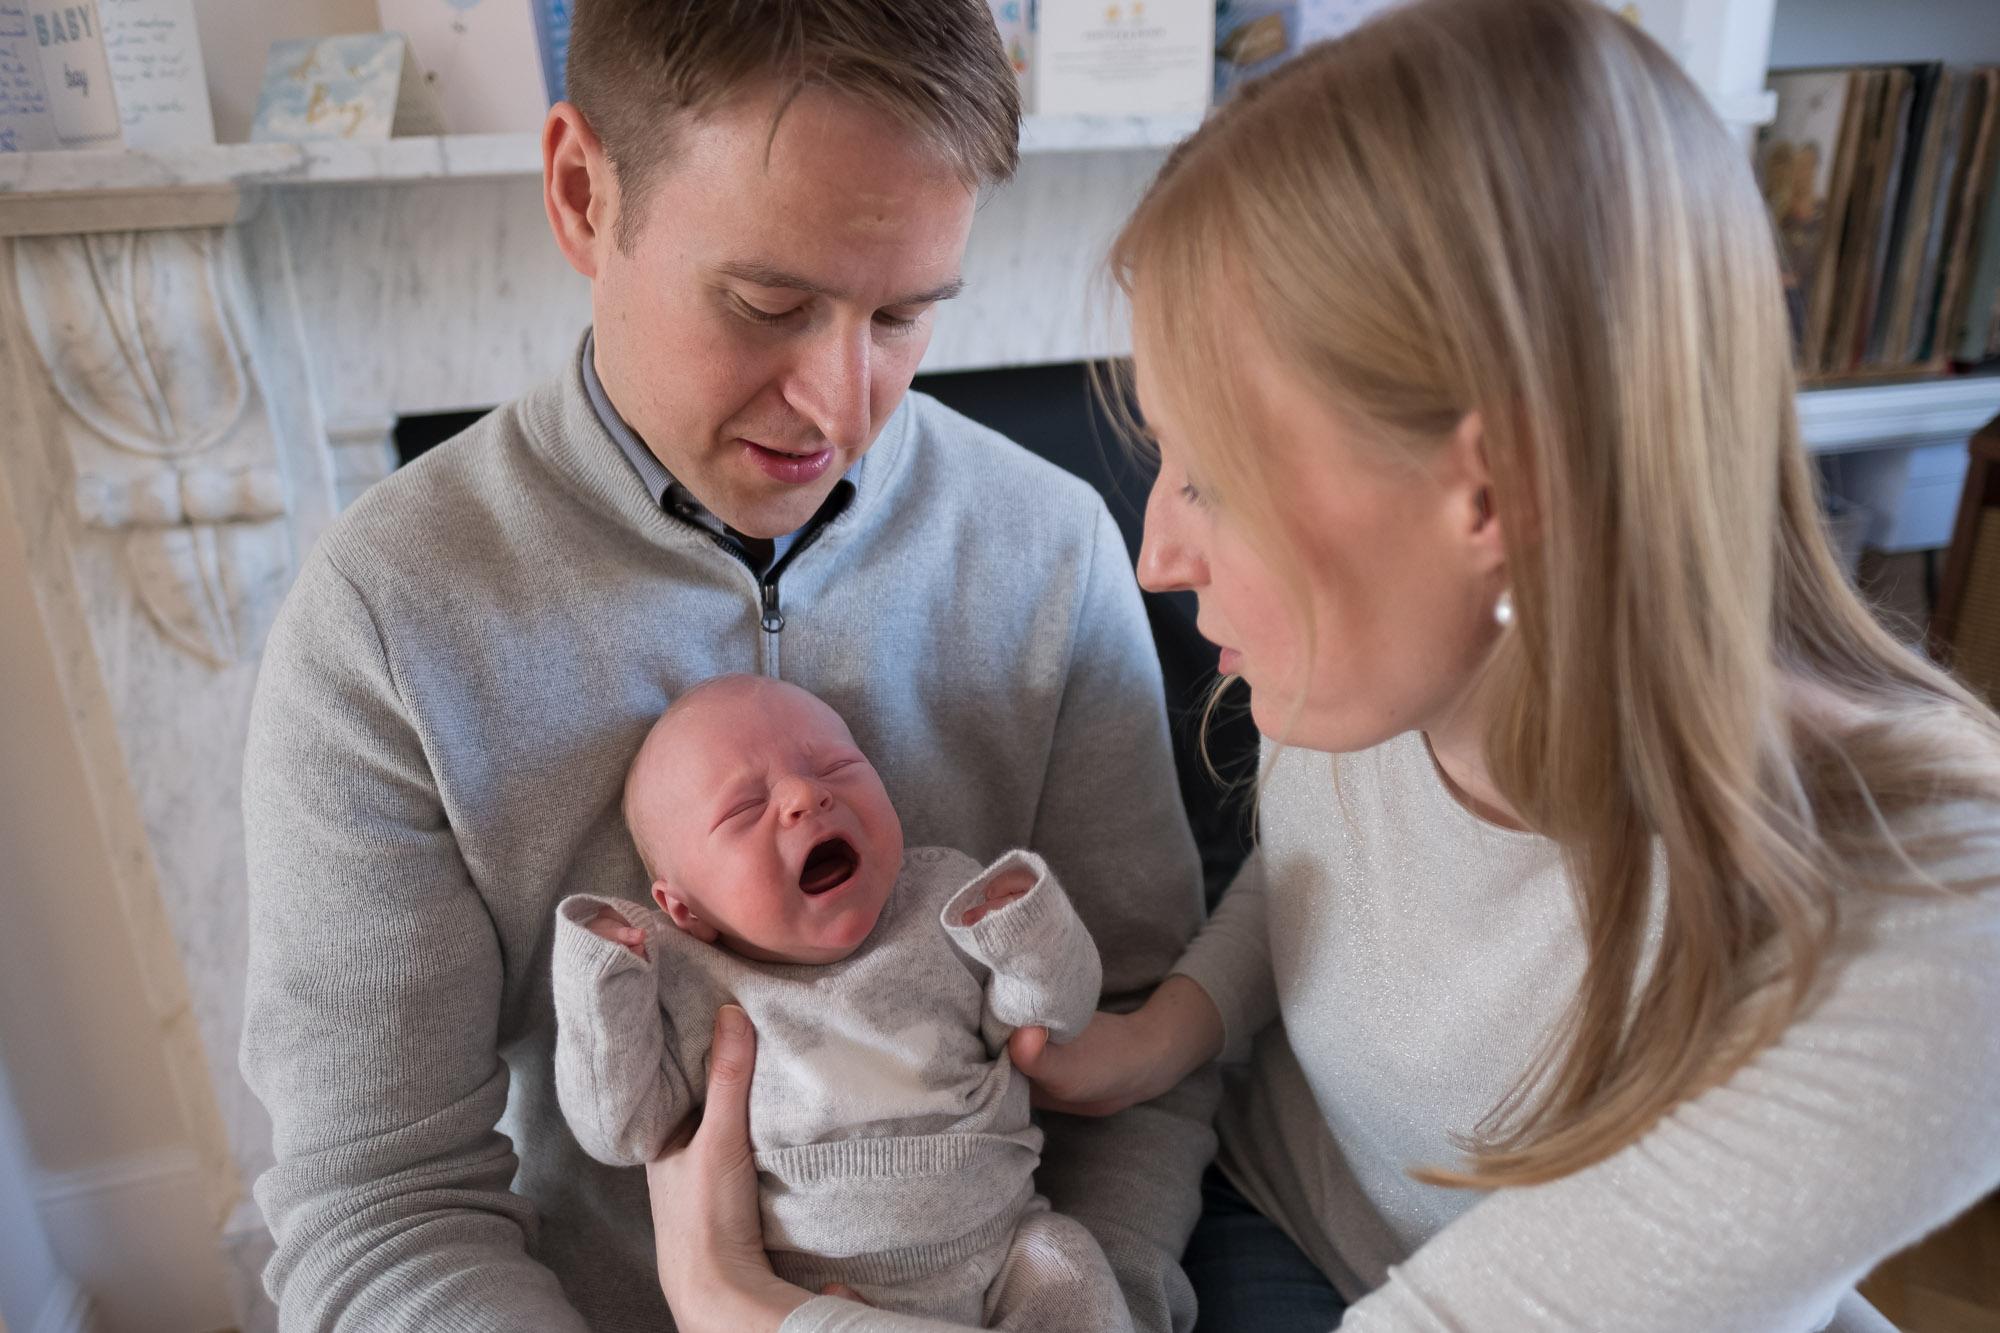 family-portrait-baby-photographer-049.jpg